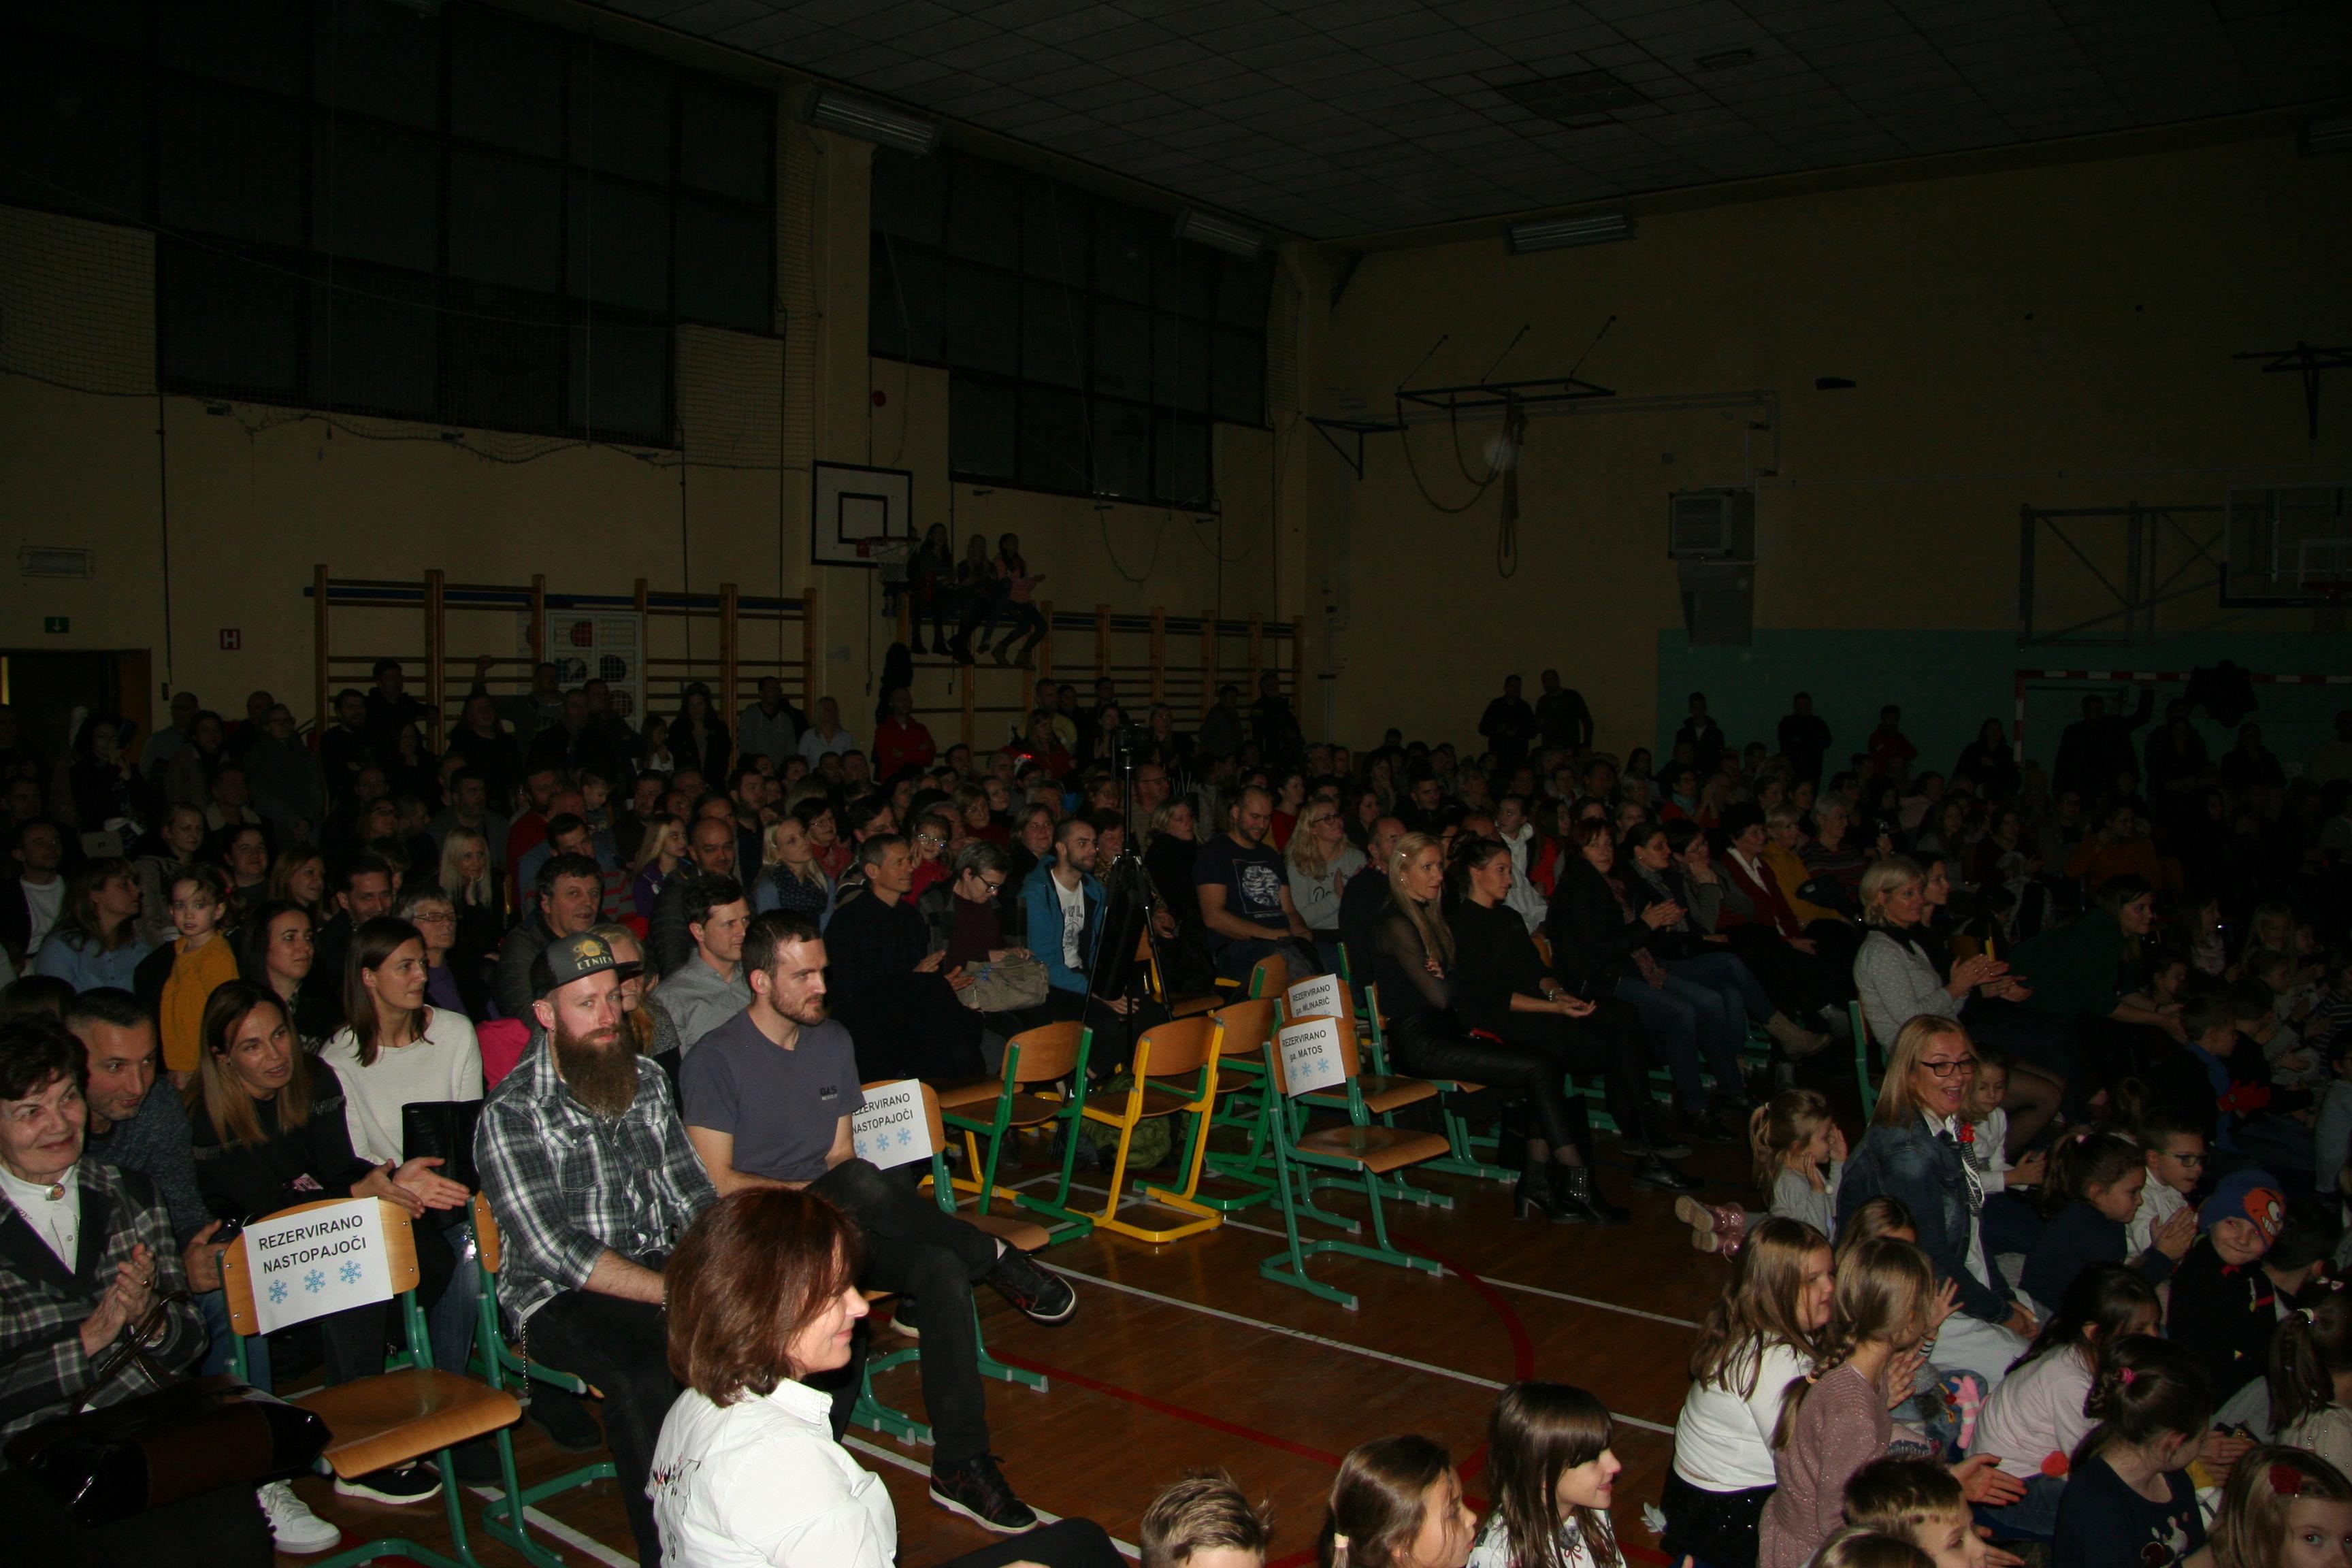 novoletno_humanitarni-koncert-2019-198